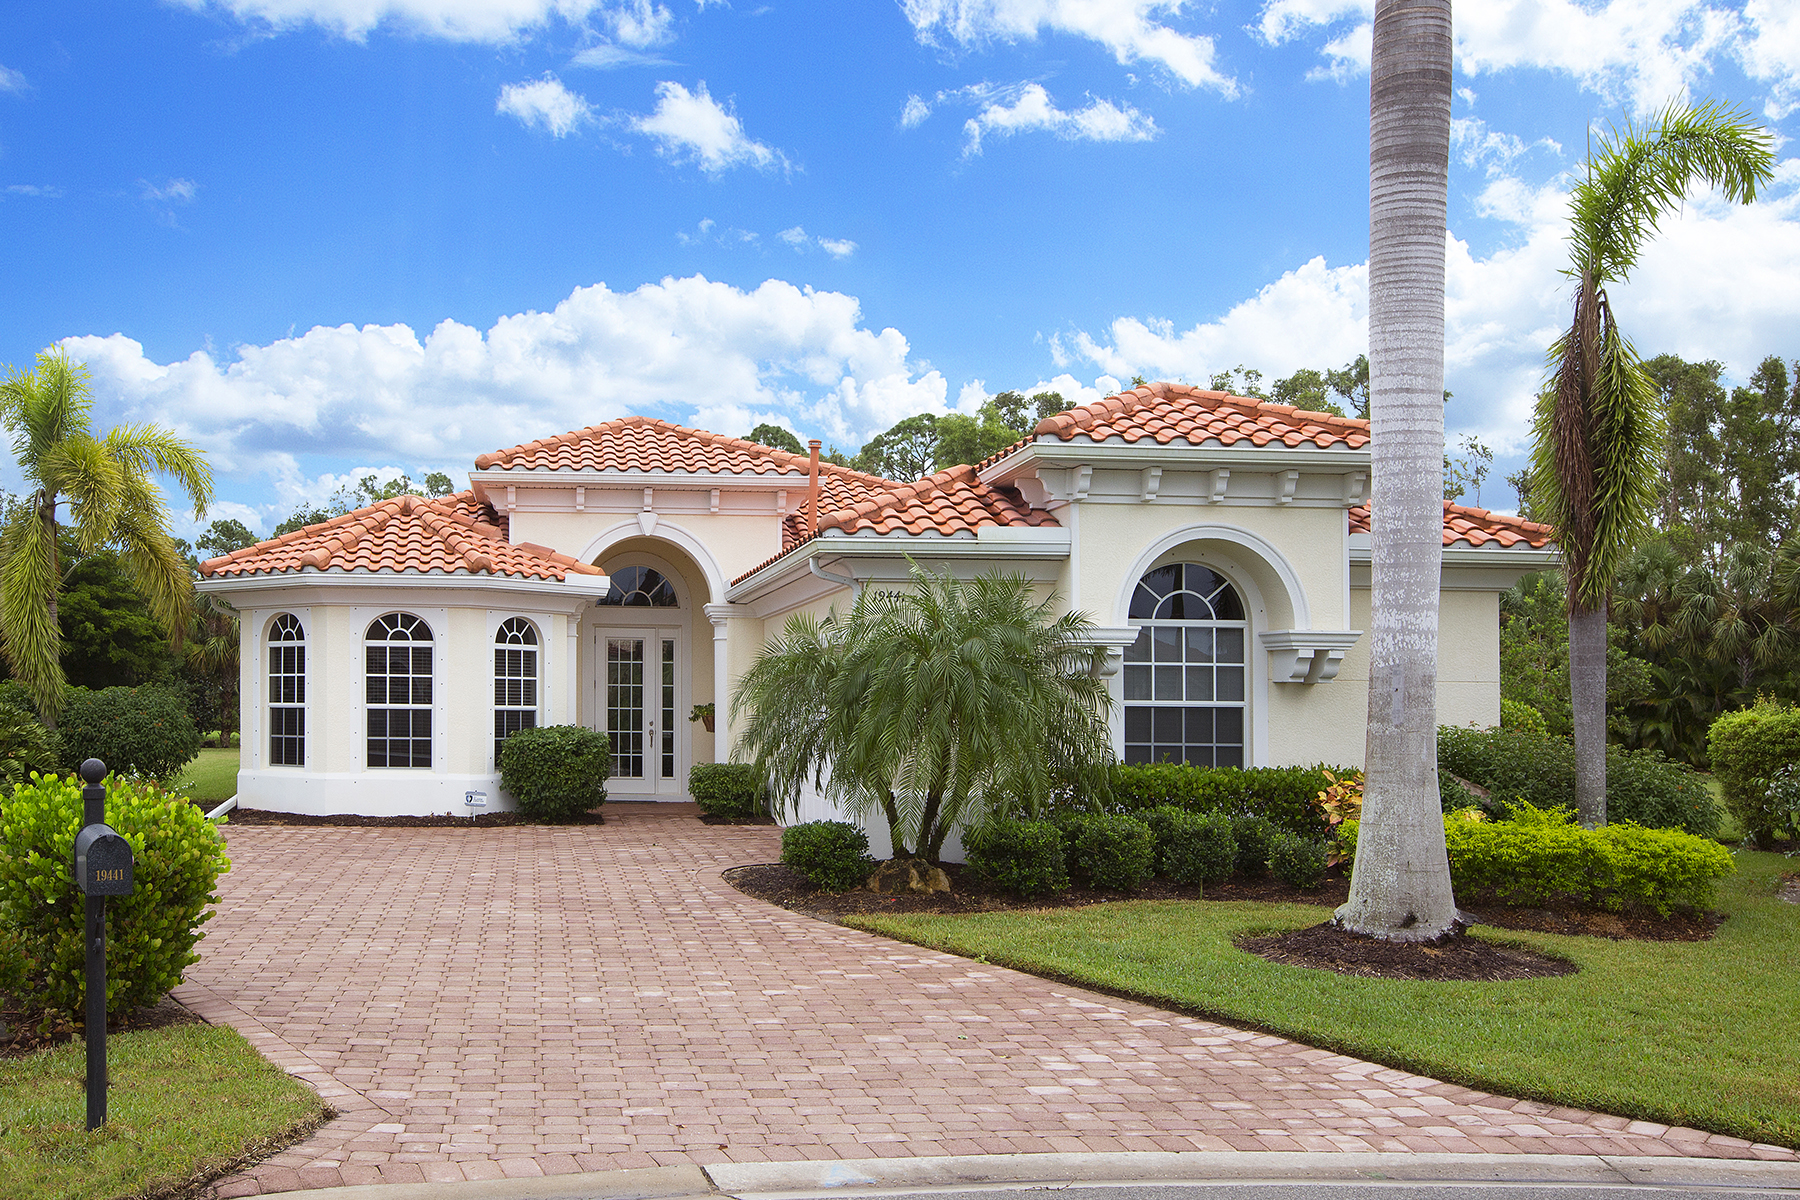 Single Family Home for Sale at BELLE LAGO 19441 Caladesi Dr, Estero, Florida, 33967 United States